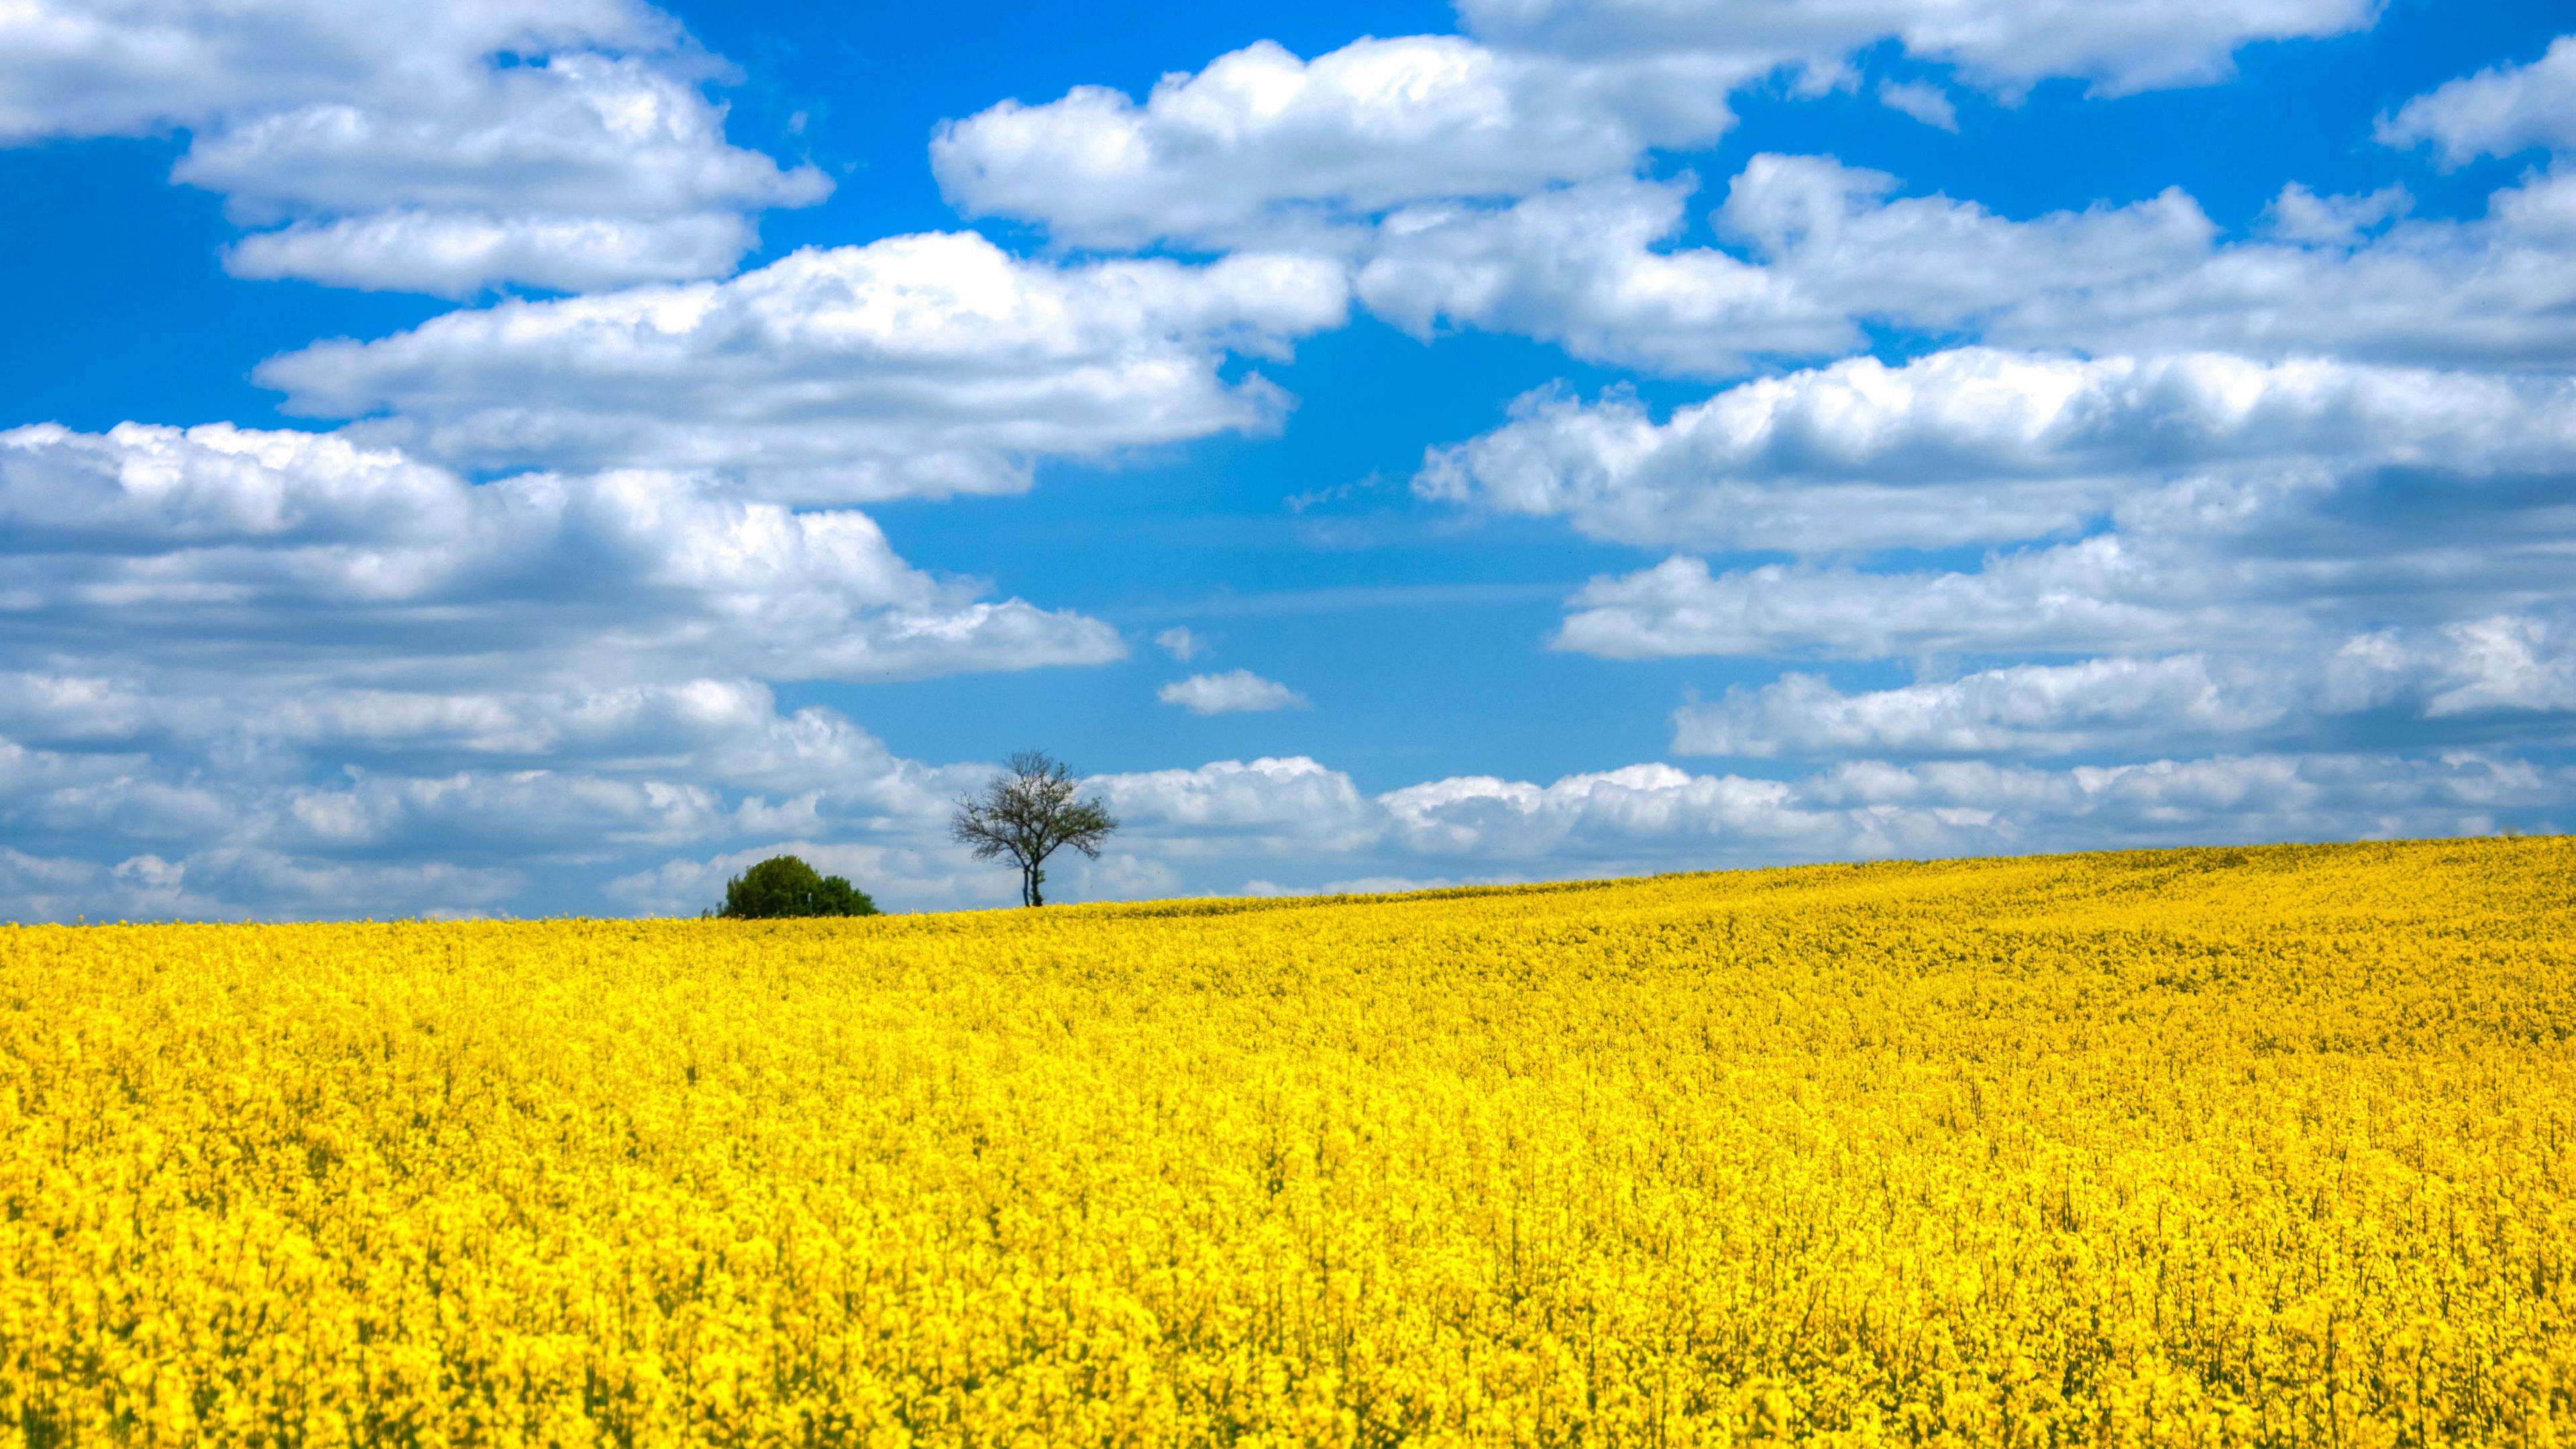 Ярко-желтое поле